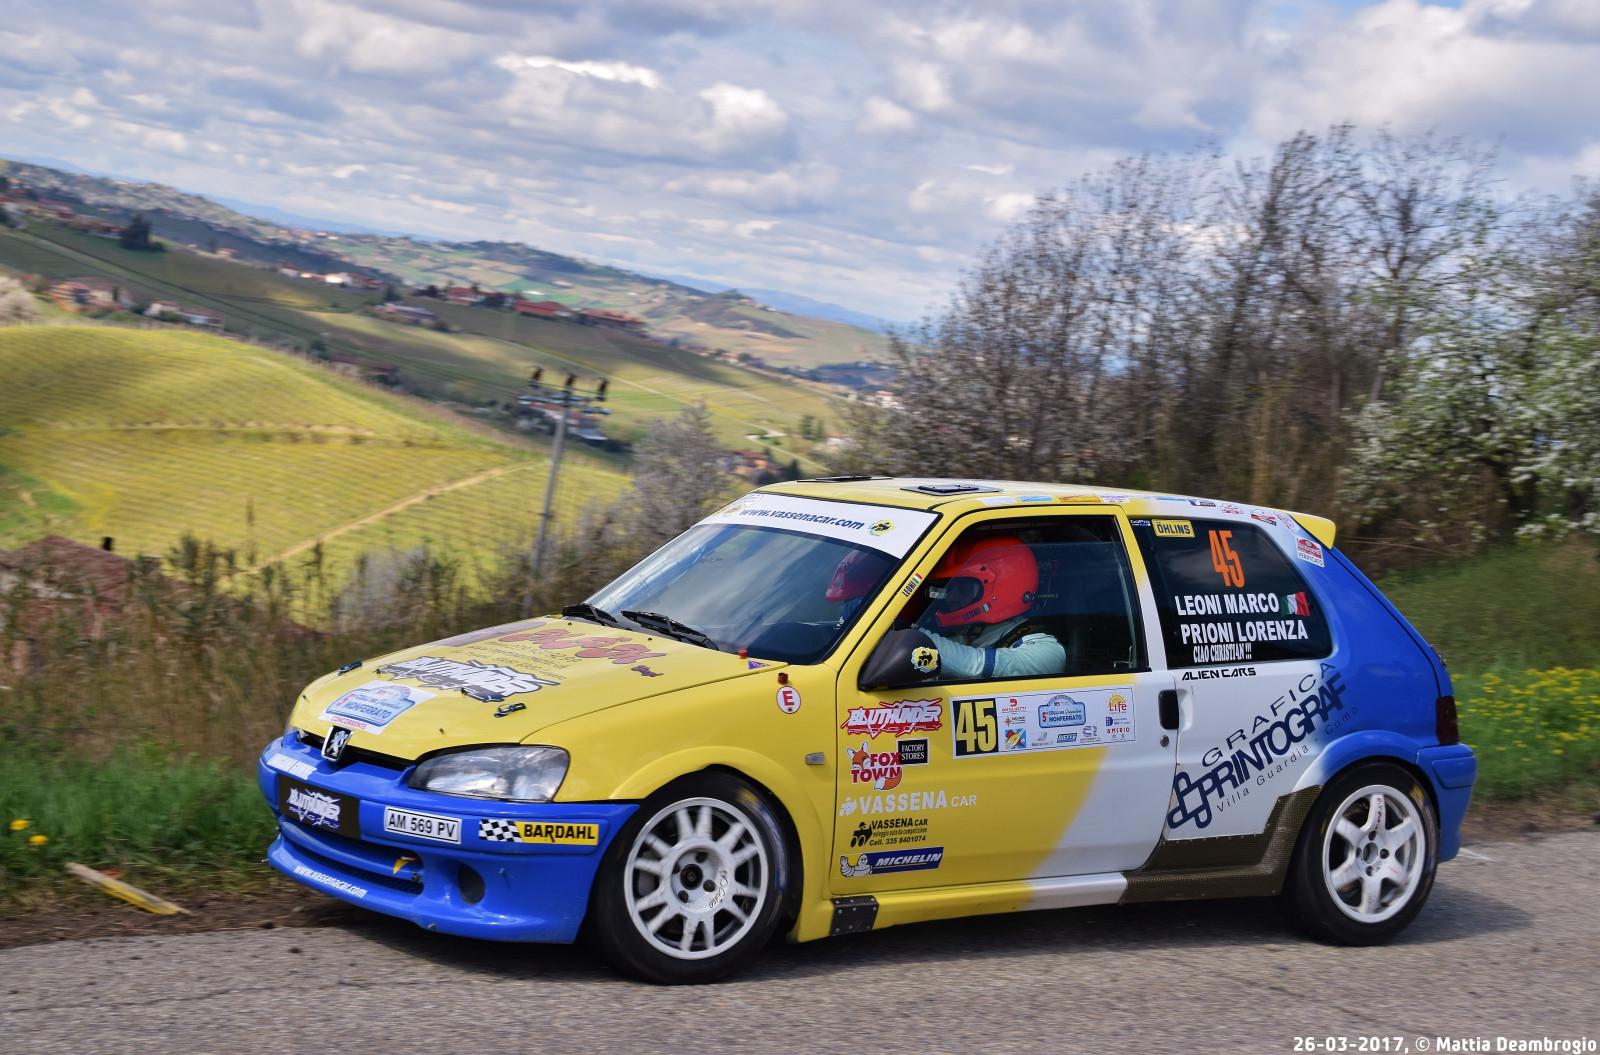 Wallpaper Peugeot 106 Rallye K10 A6 16 Canelli Rally Colli Del Grignolino 2017 5948x3922 1127548 Hd Wallpapers Wallhere